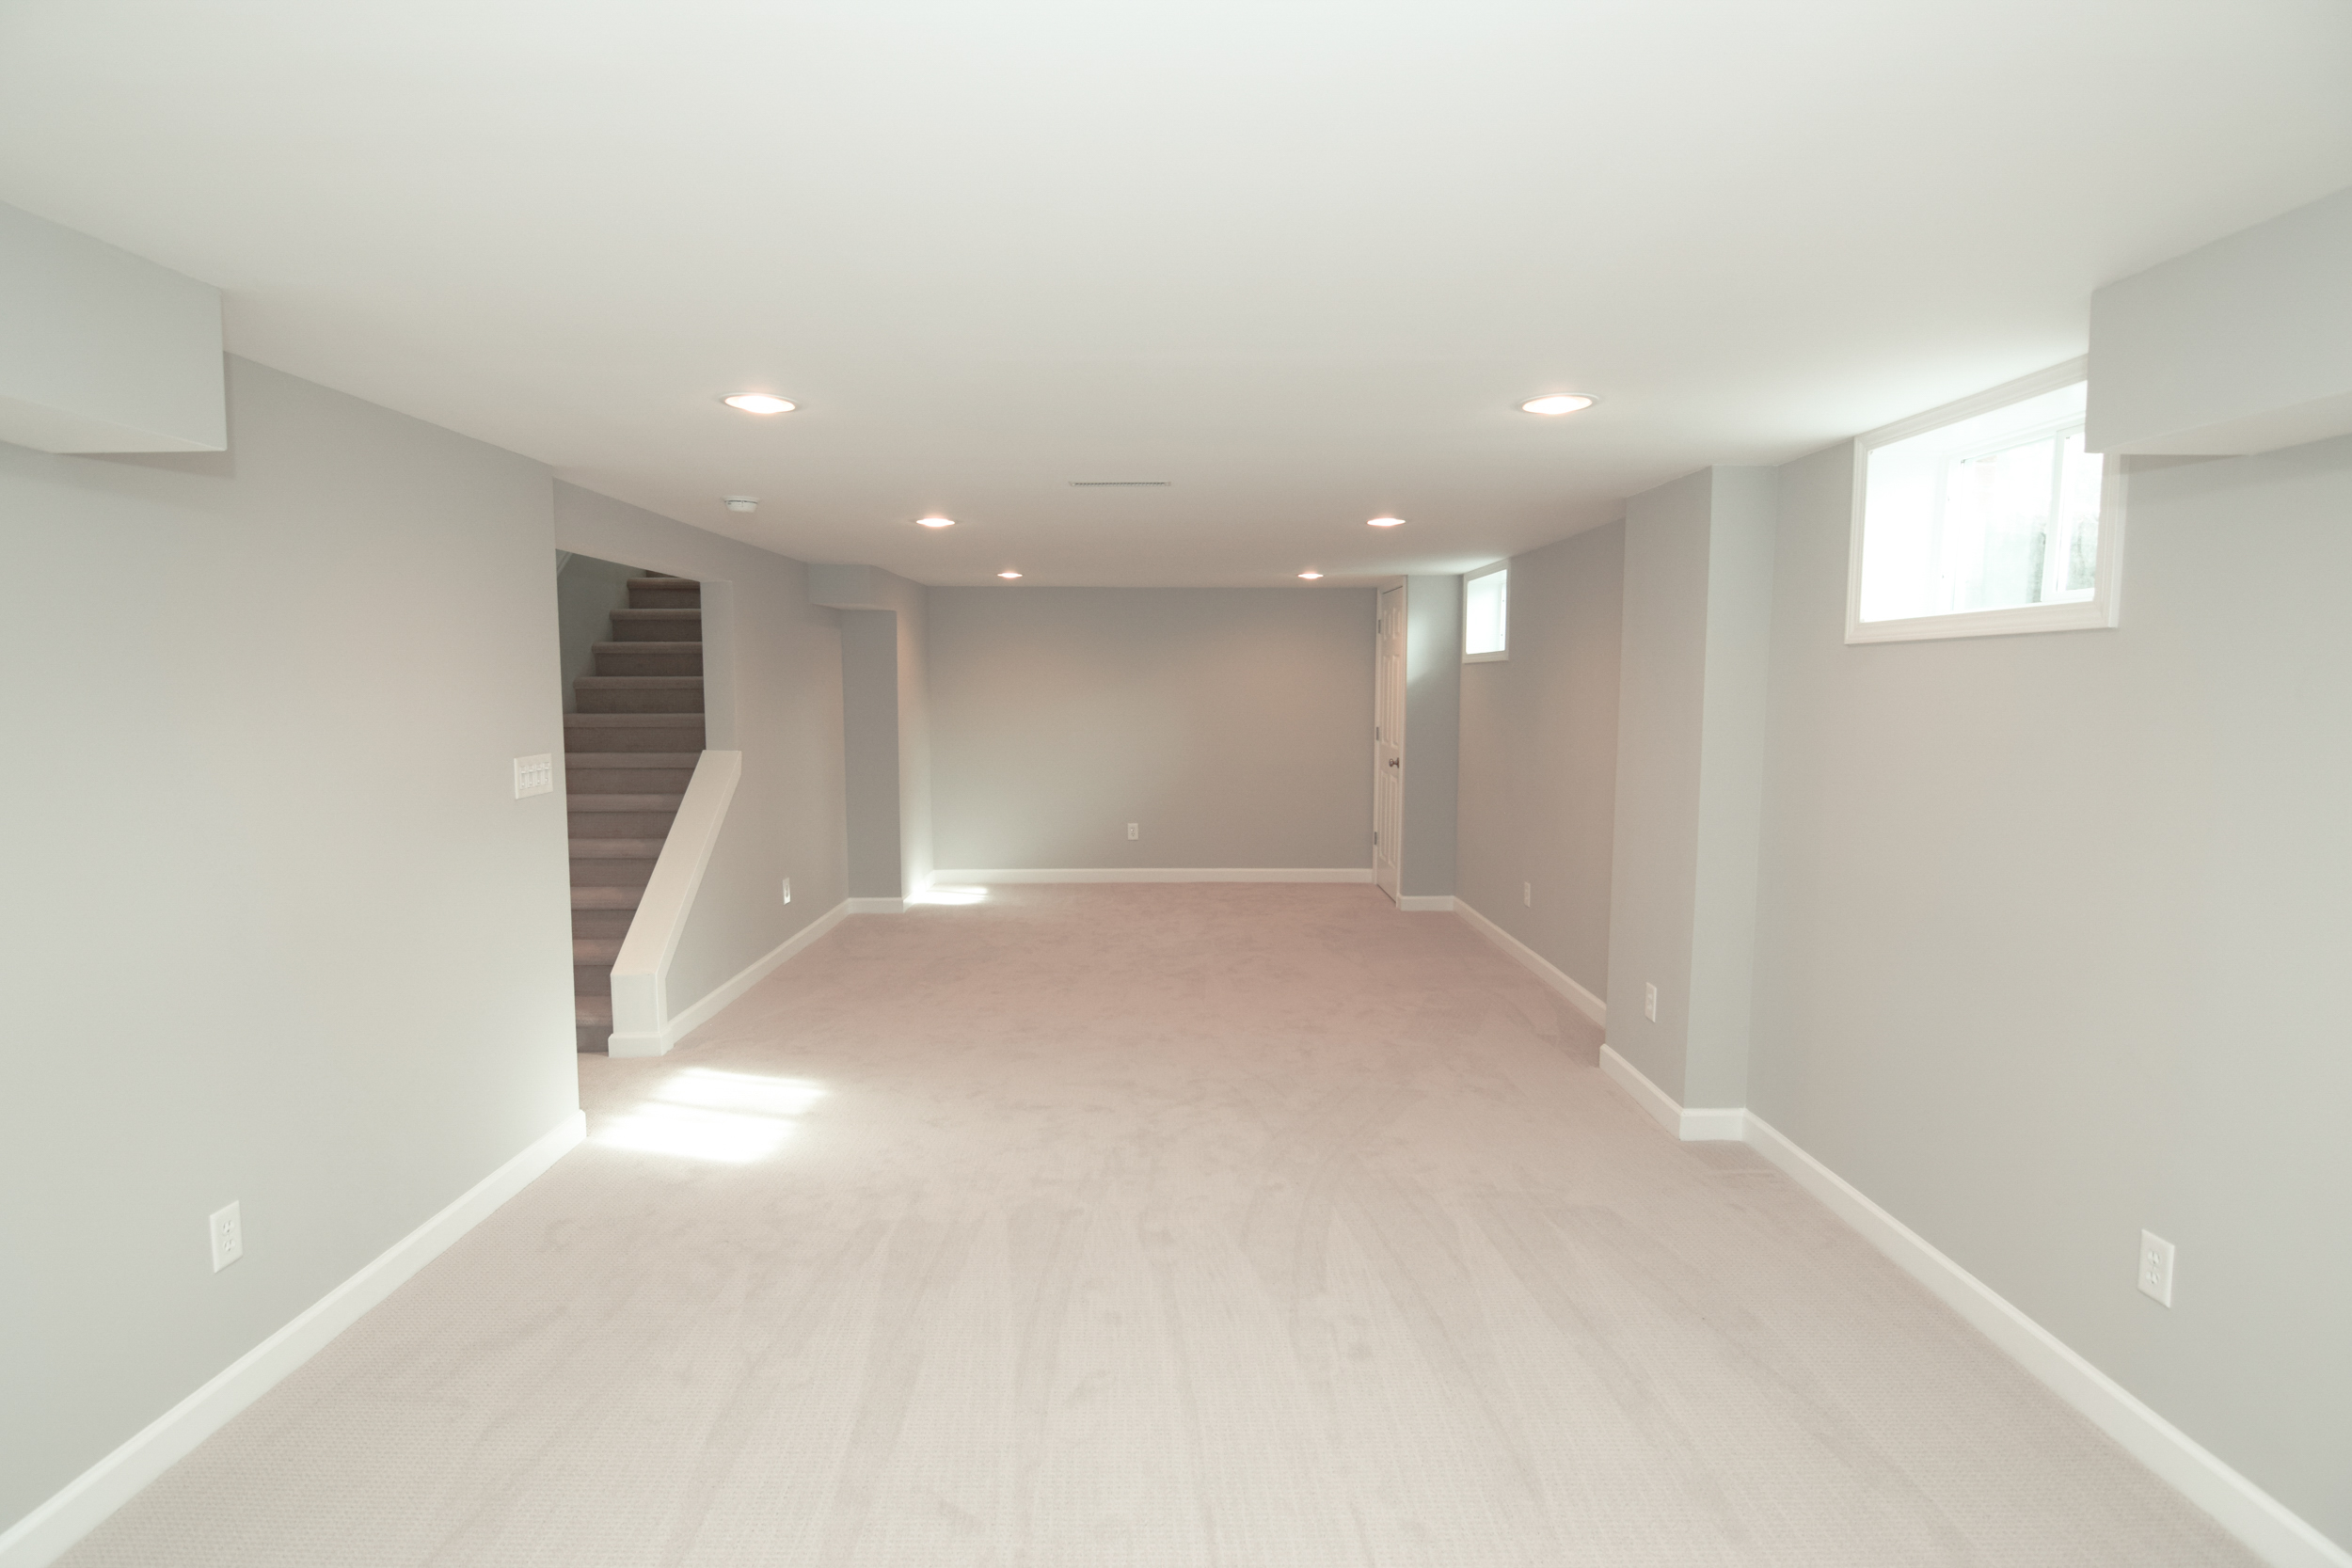 Monarch Homes | The House Next Door | Basement - After